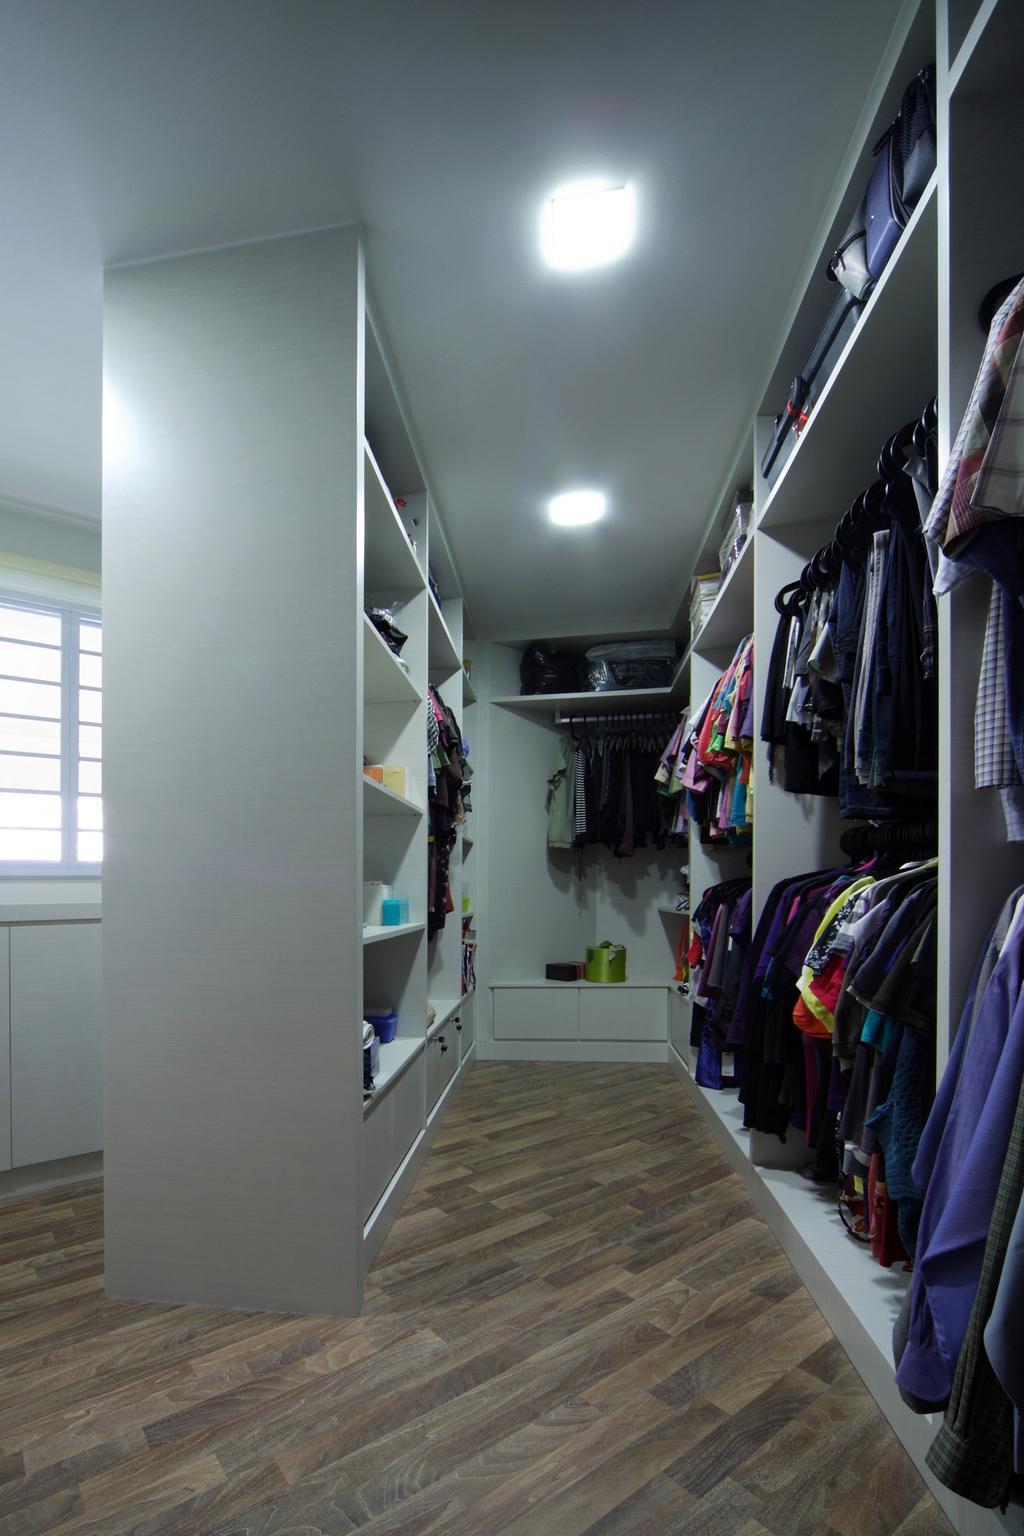 Transitional, HDB, Bedroom, Hougang Avenue 2, Interior Designer, Chapter One Interior Design, Walk In Wardrobe, Racks, Parquet, Shelf, Shelves, White